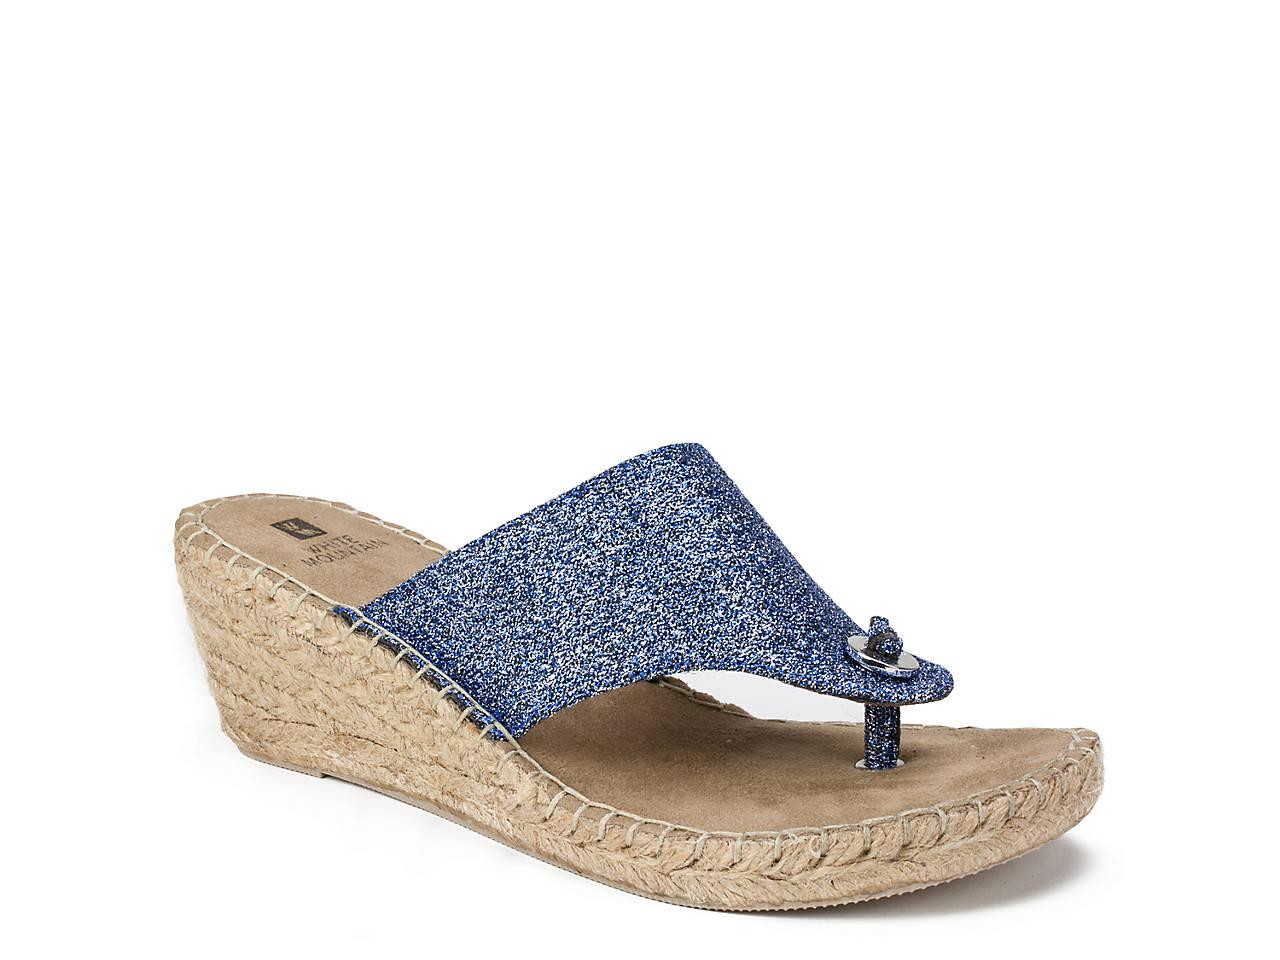 d55044267 White Mountain Beachball Espadrille Wedge Sandal Women s Shoes